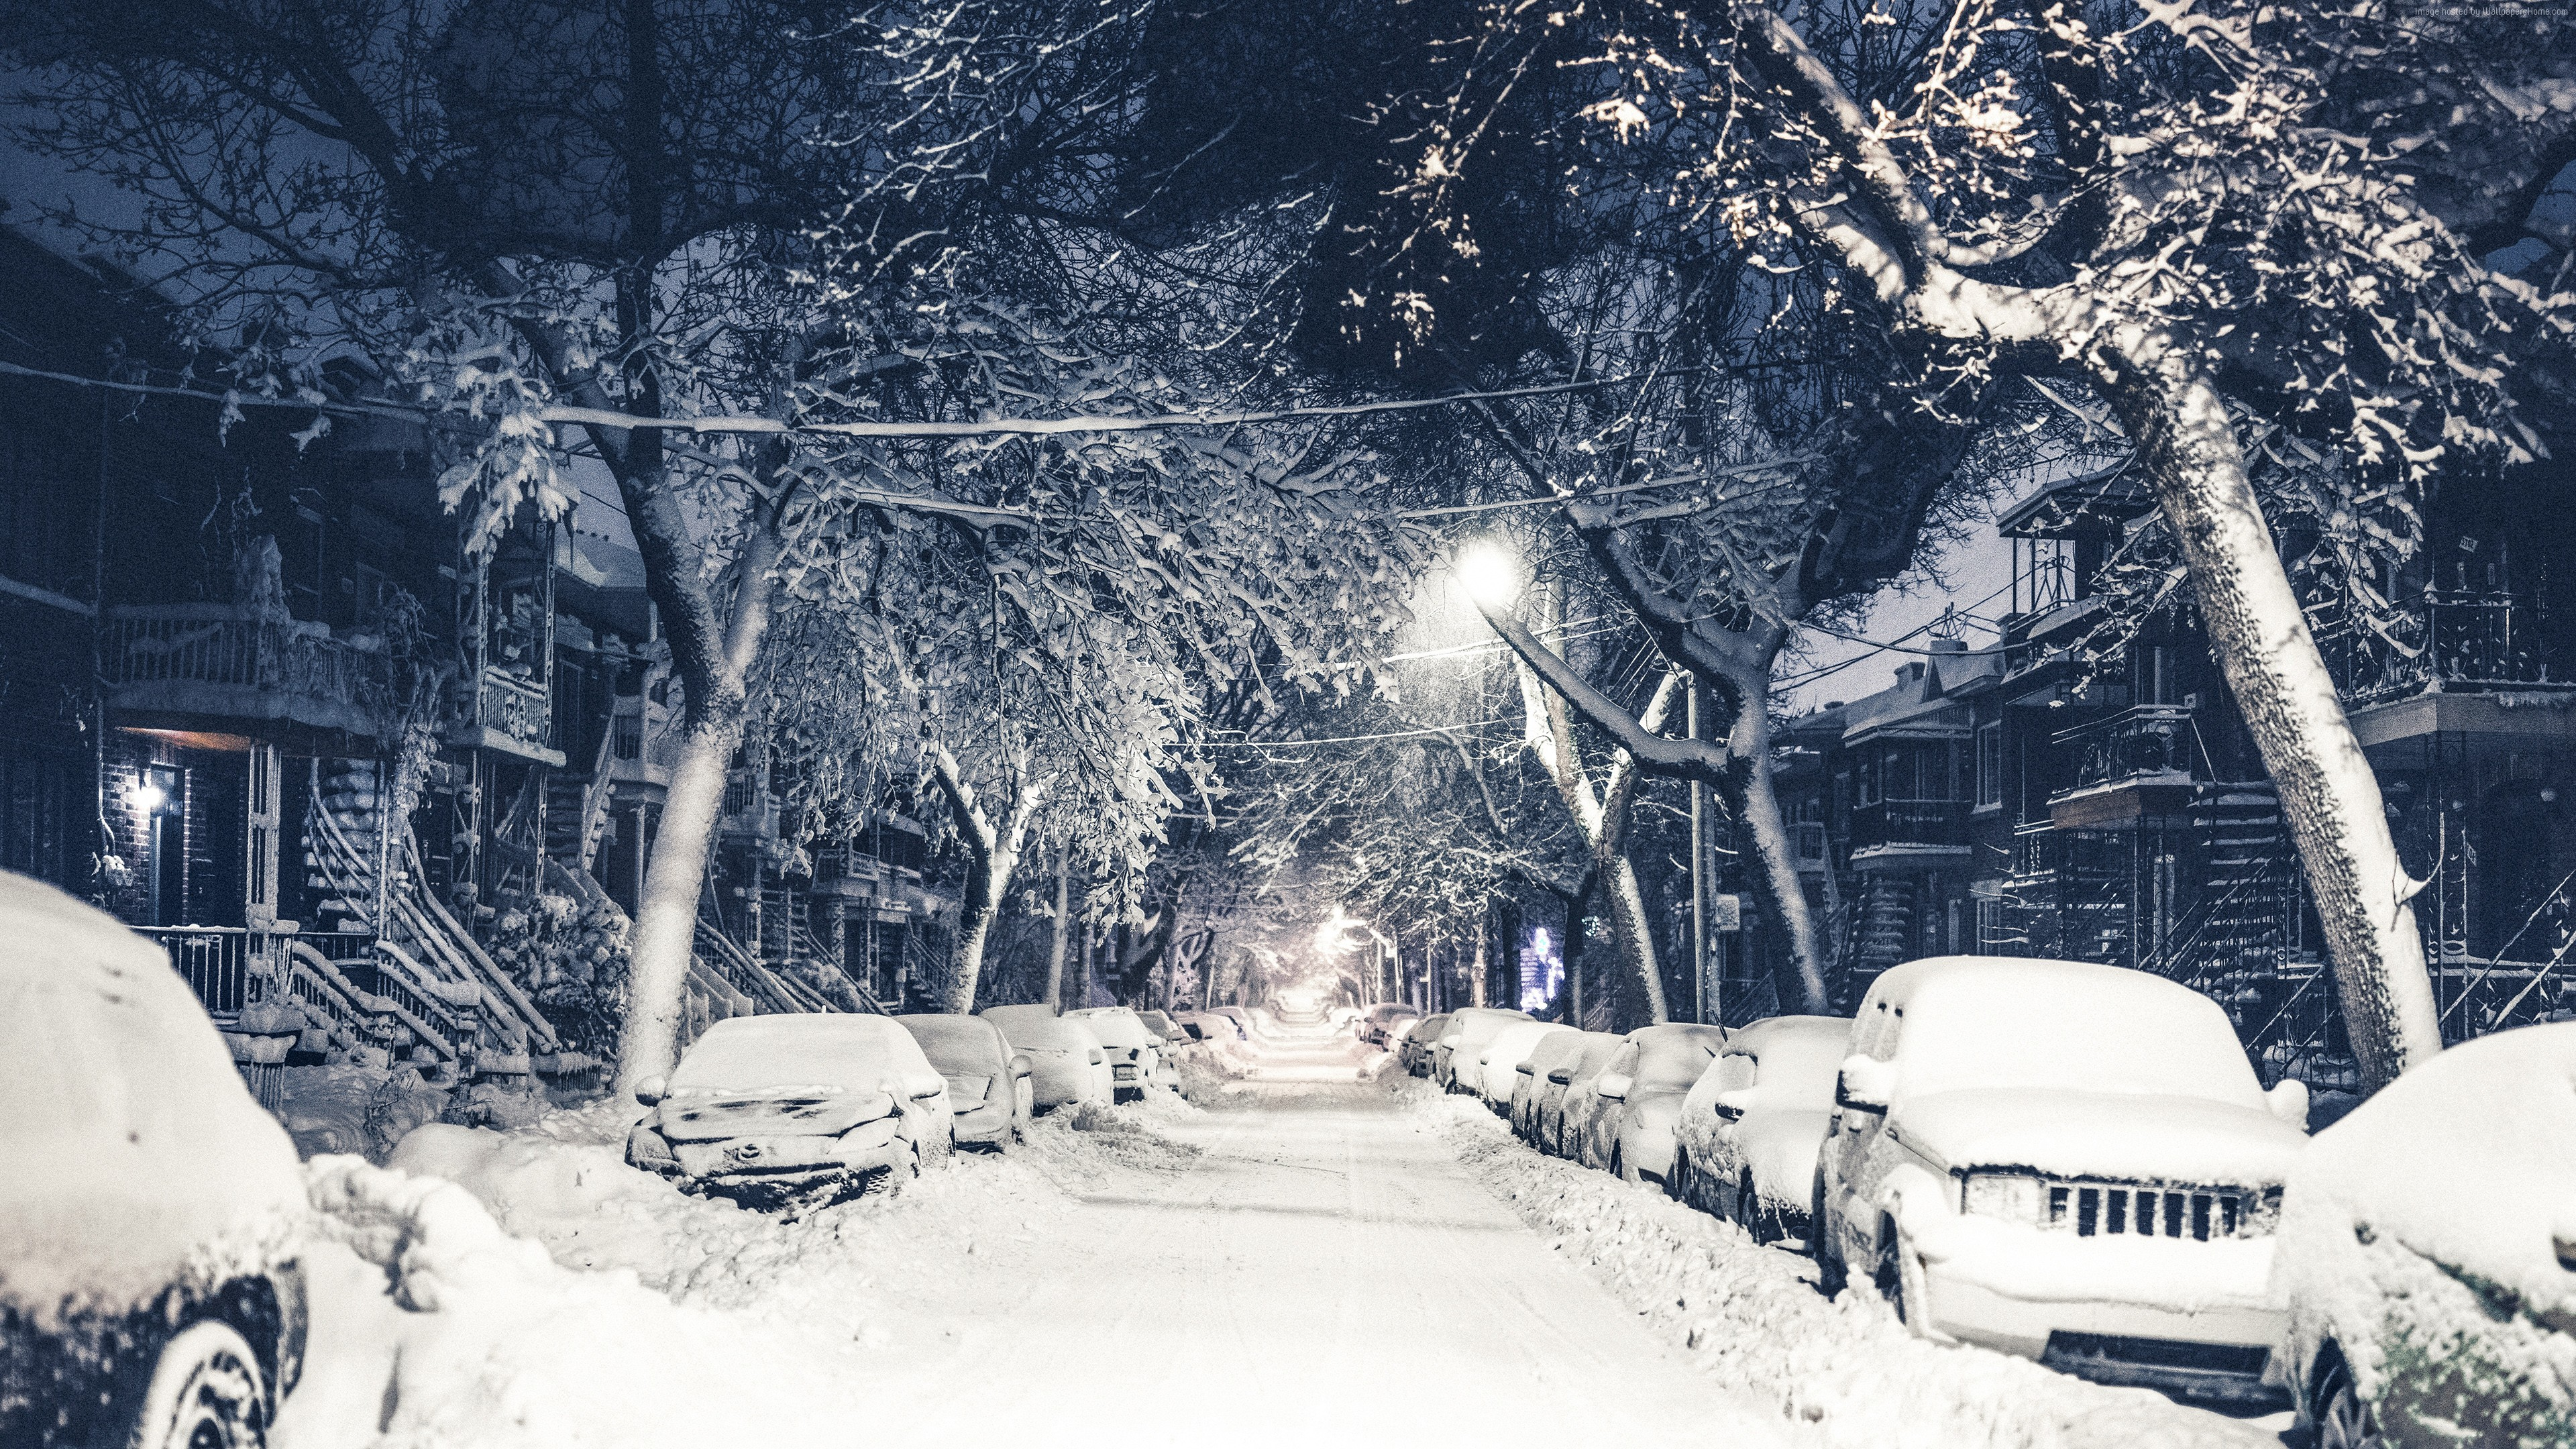 snow 5k winter street 4k New York 3840x2160